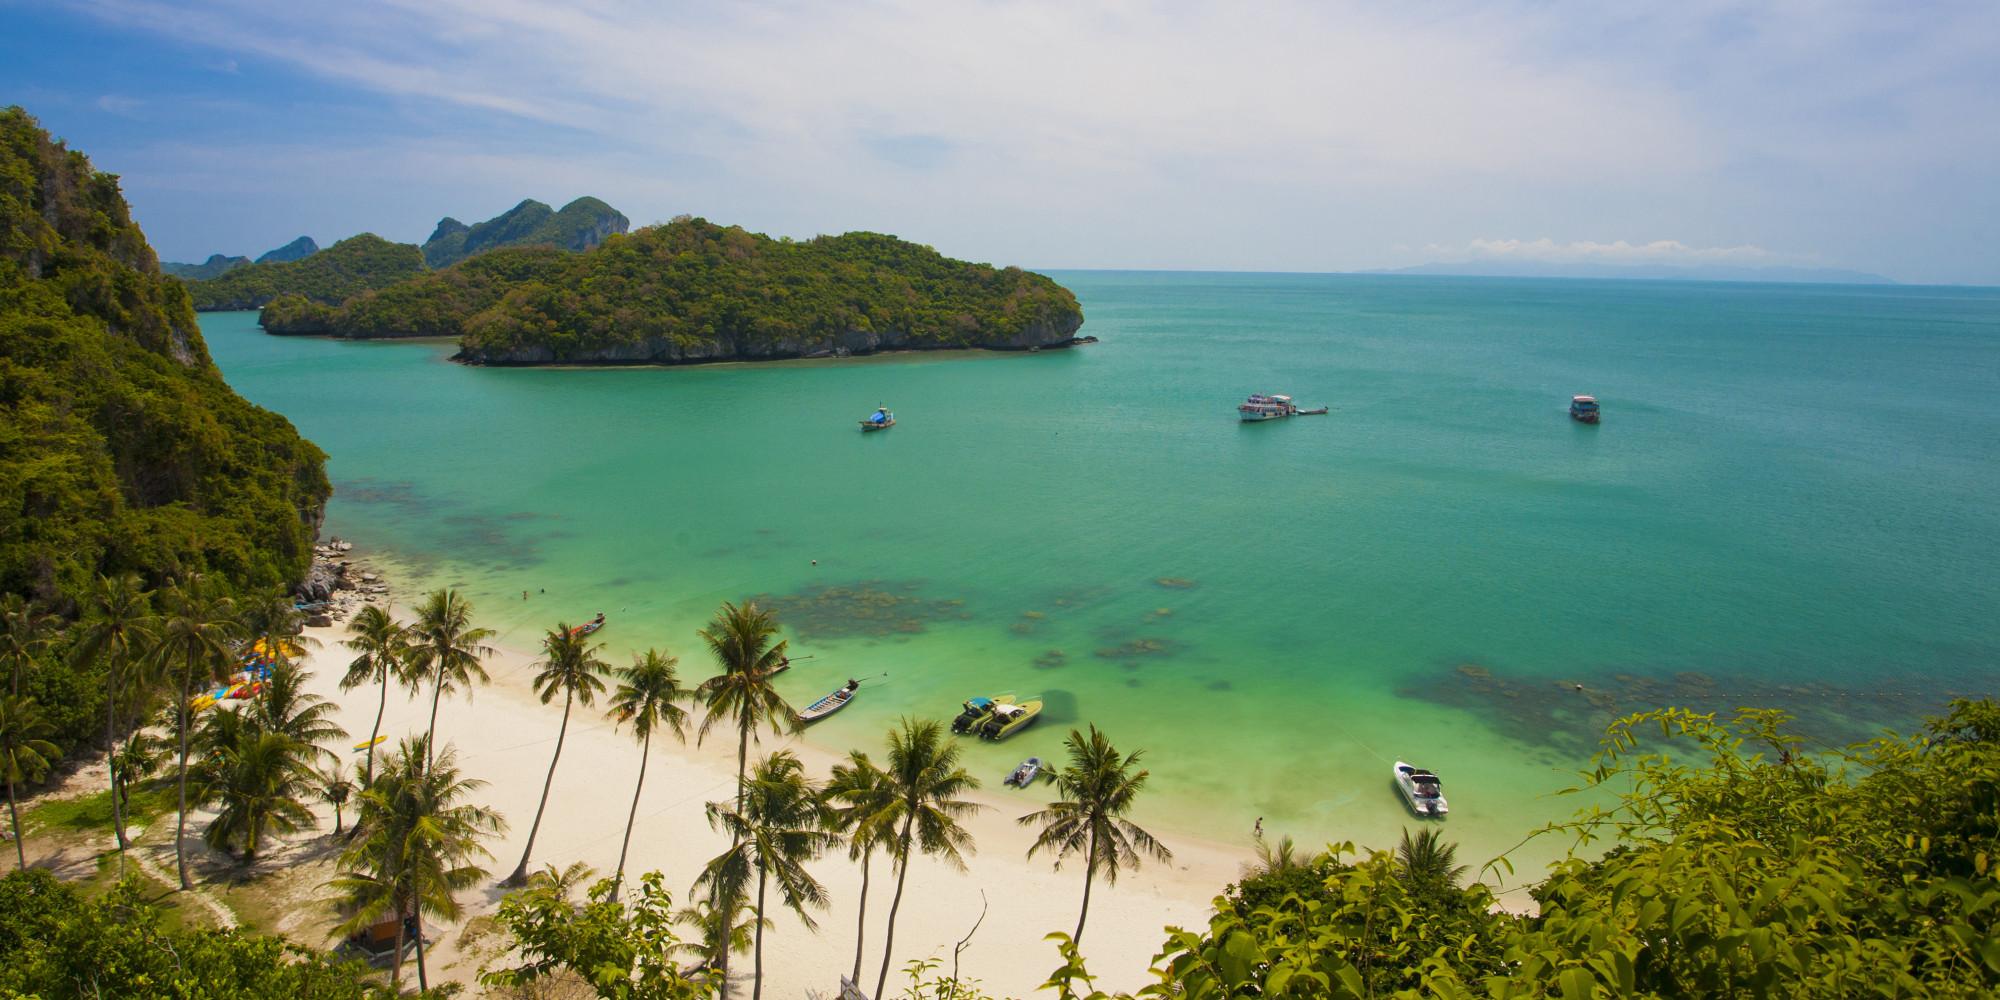 koh phangan salad haad samui secret thailand resort kept seasons four huffpost luxe